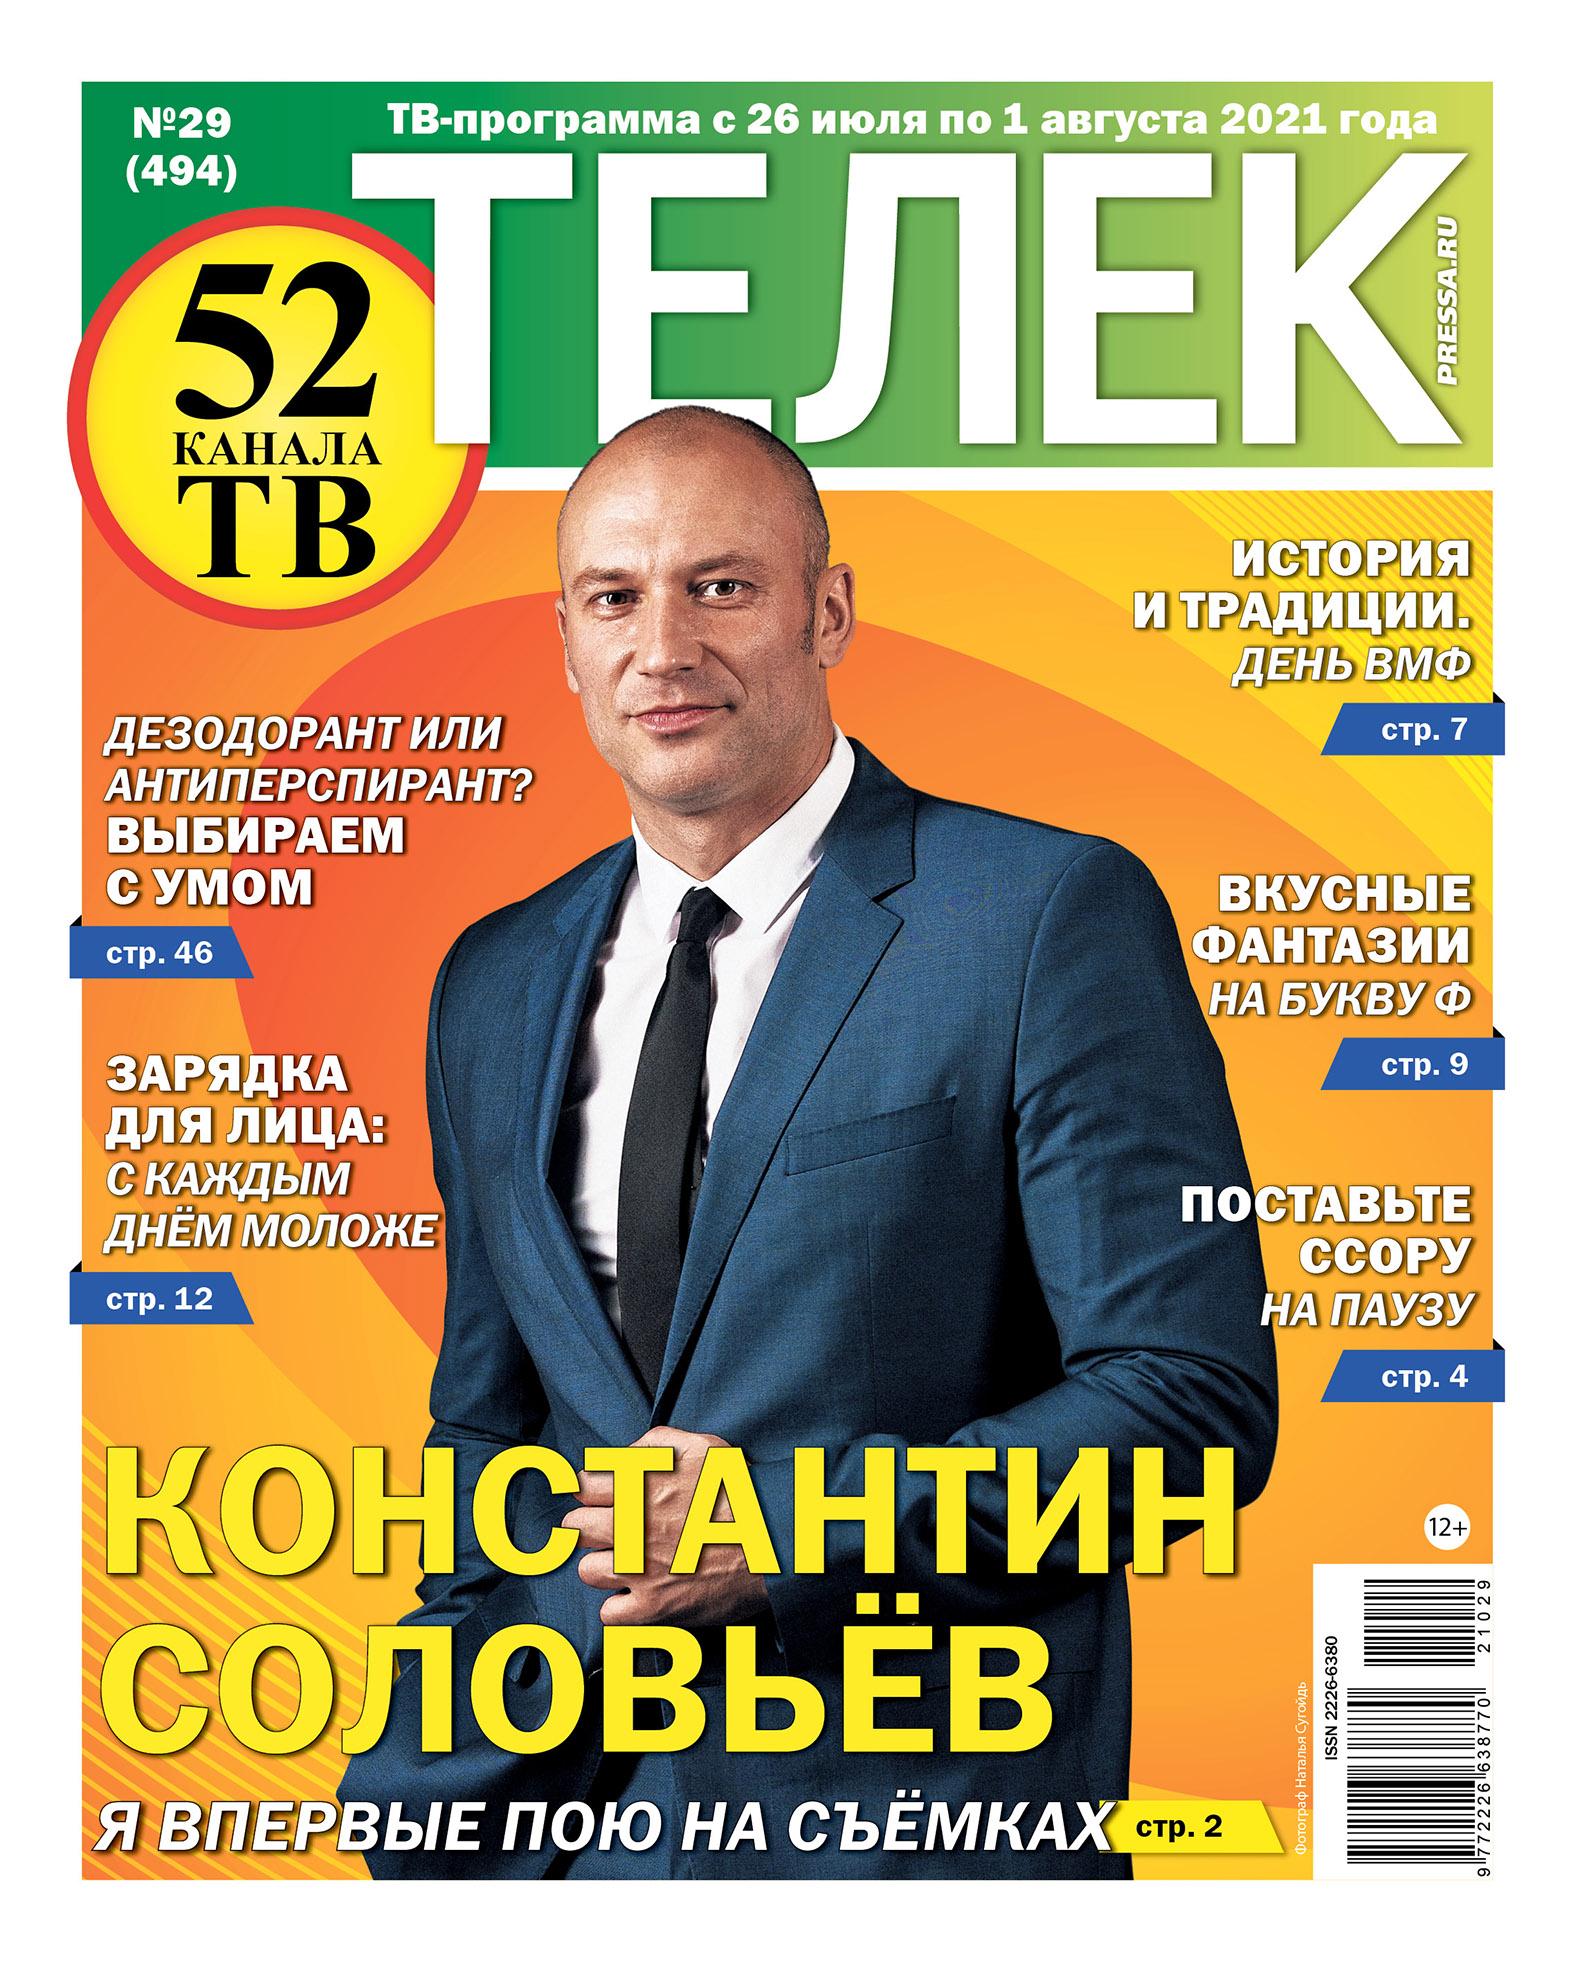 №29 (494) Константин Соловьев